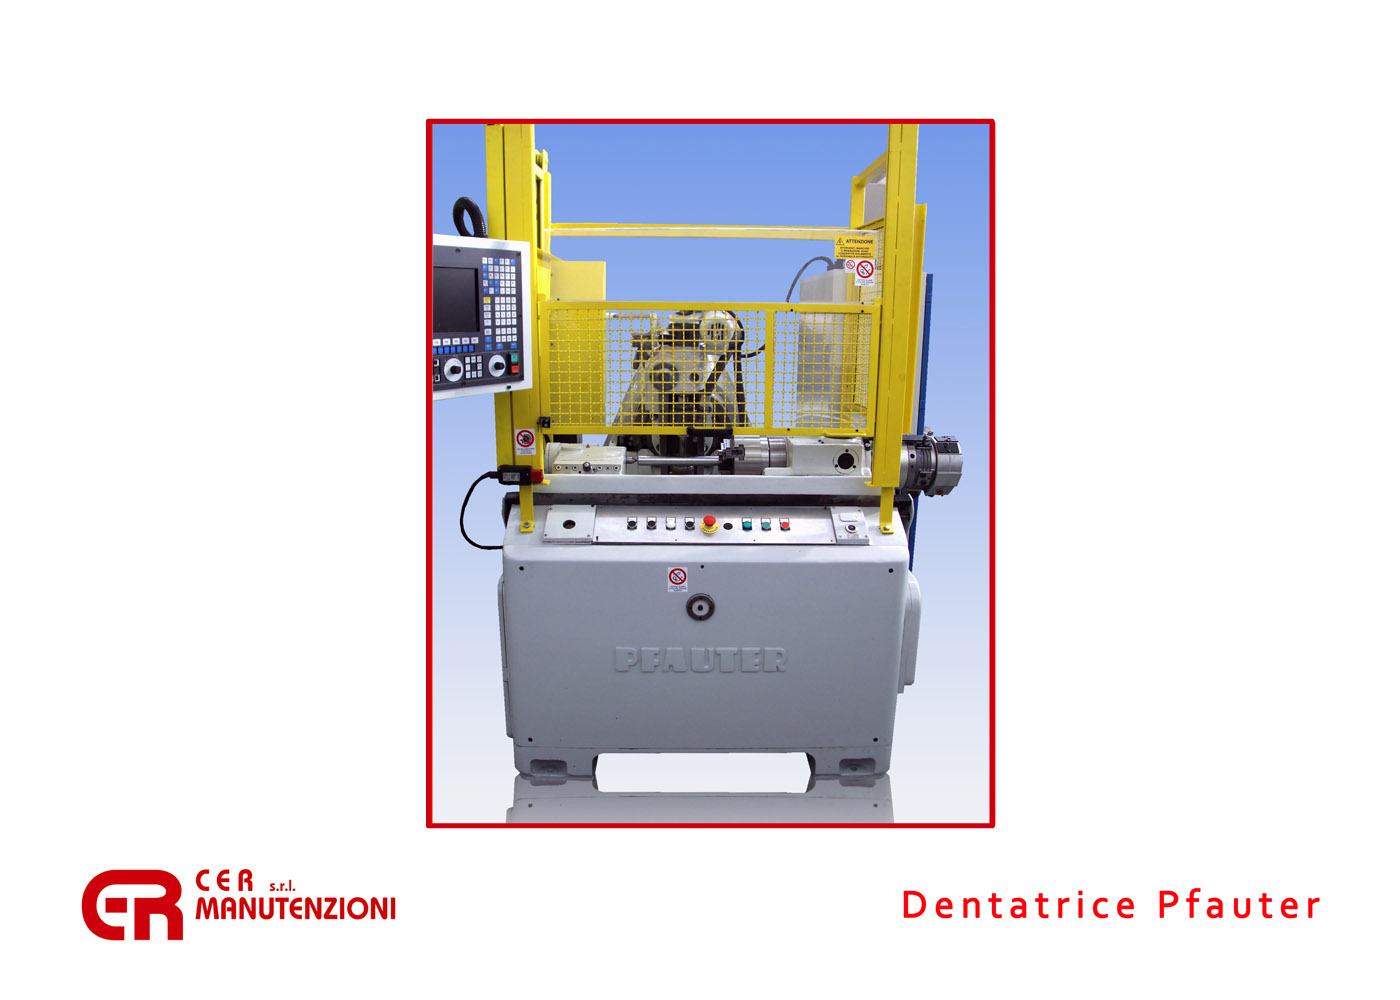 08_Dentarice